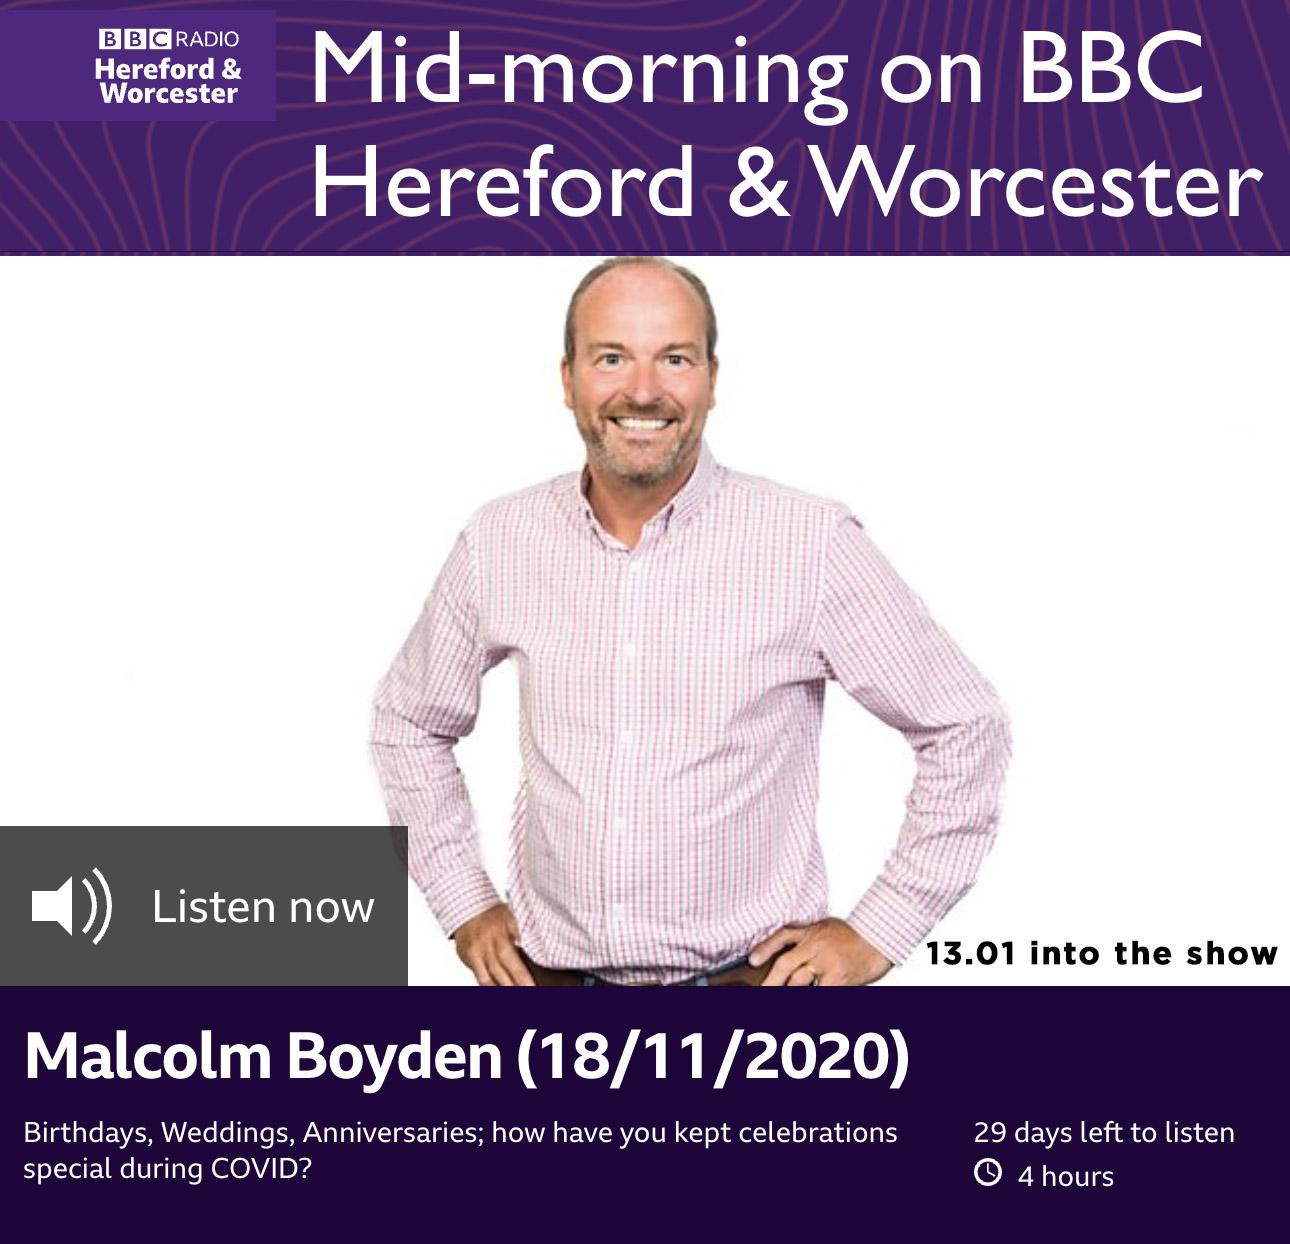 Liz Taylor inspires one family's lockdown anniversary celebration BBC Hereford & Worcester Malcolm Boyden 18.11.2020